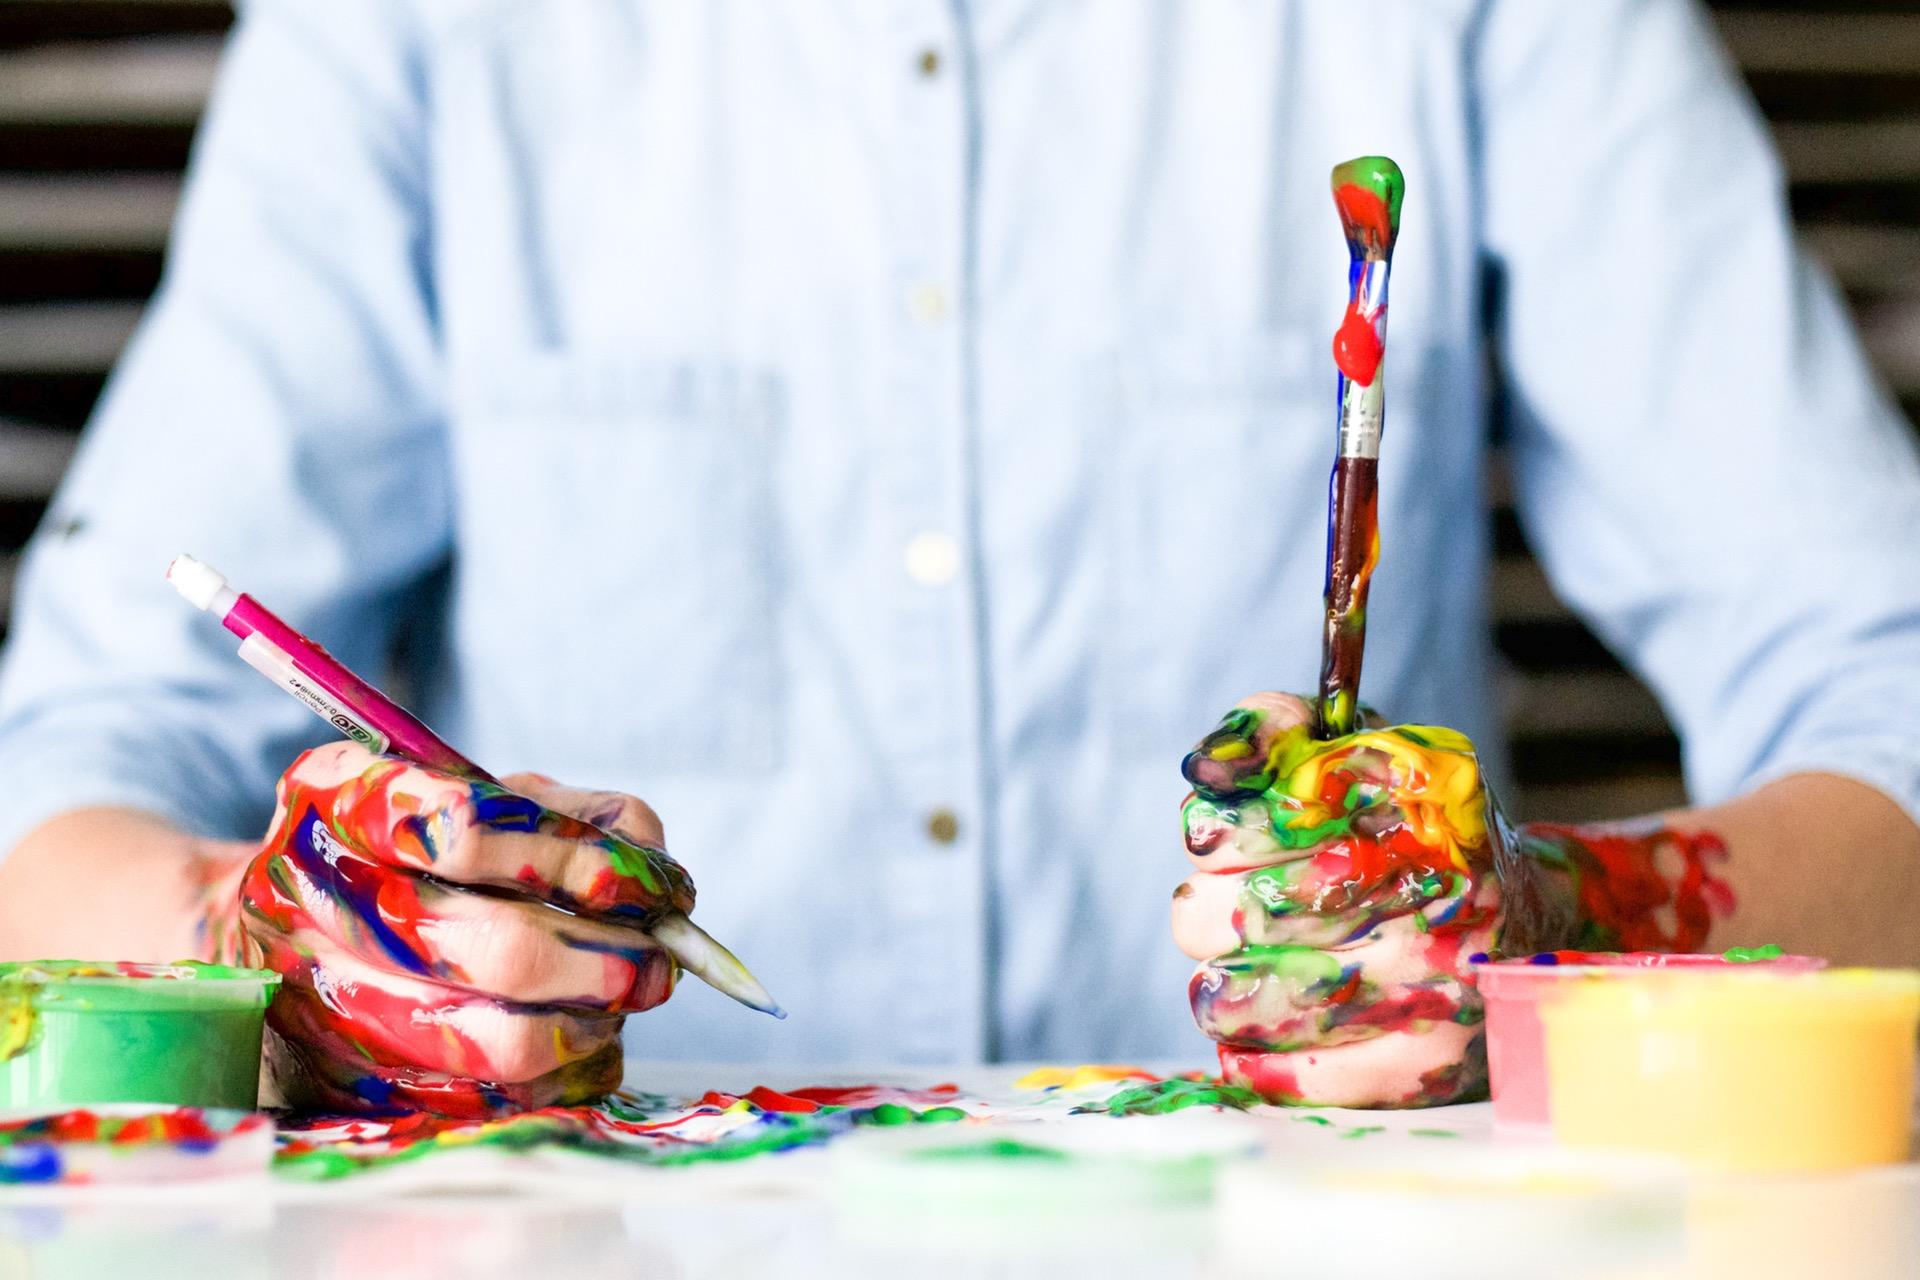 Artificial intelligence is democratizing art's creation.